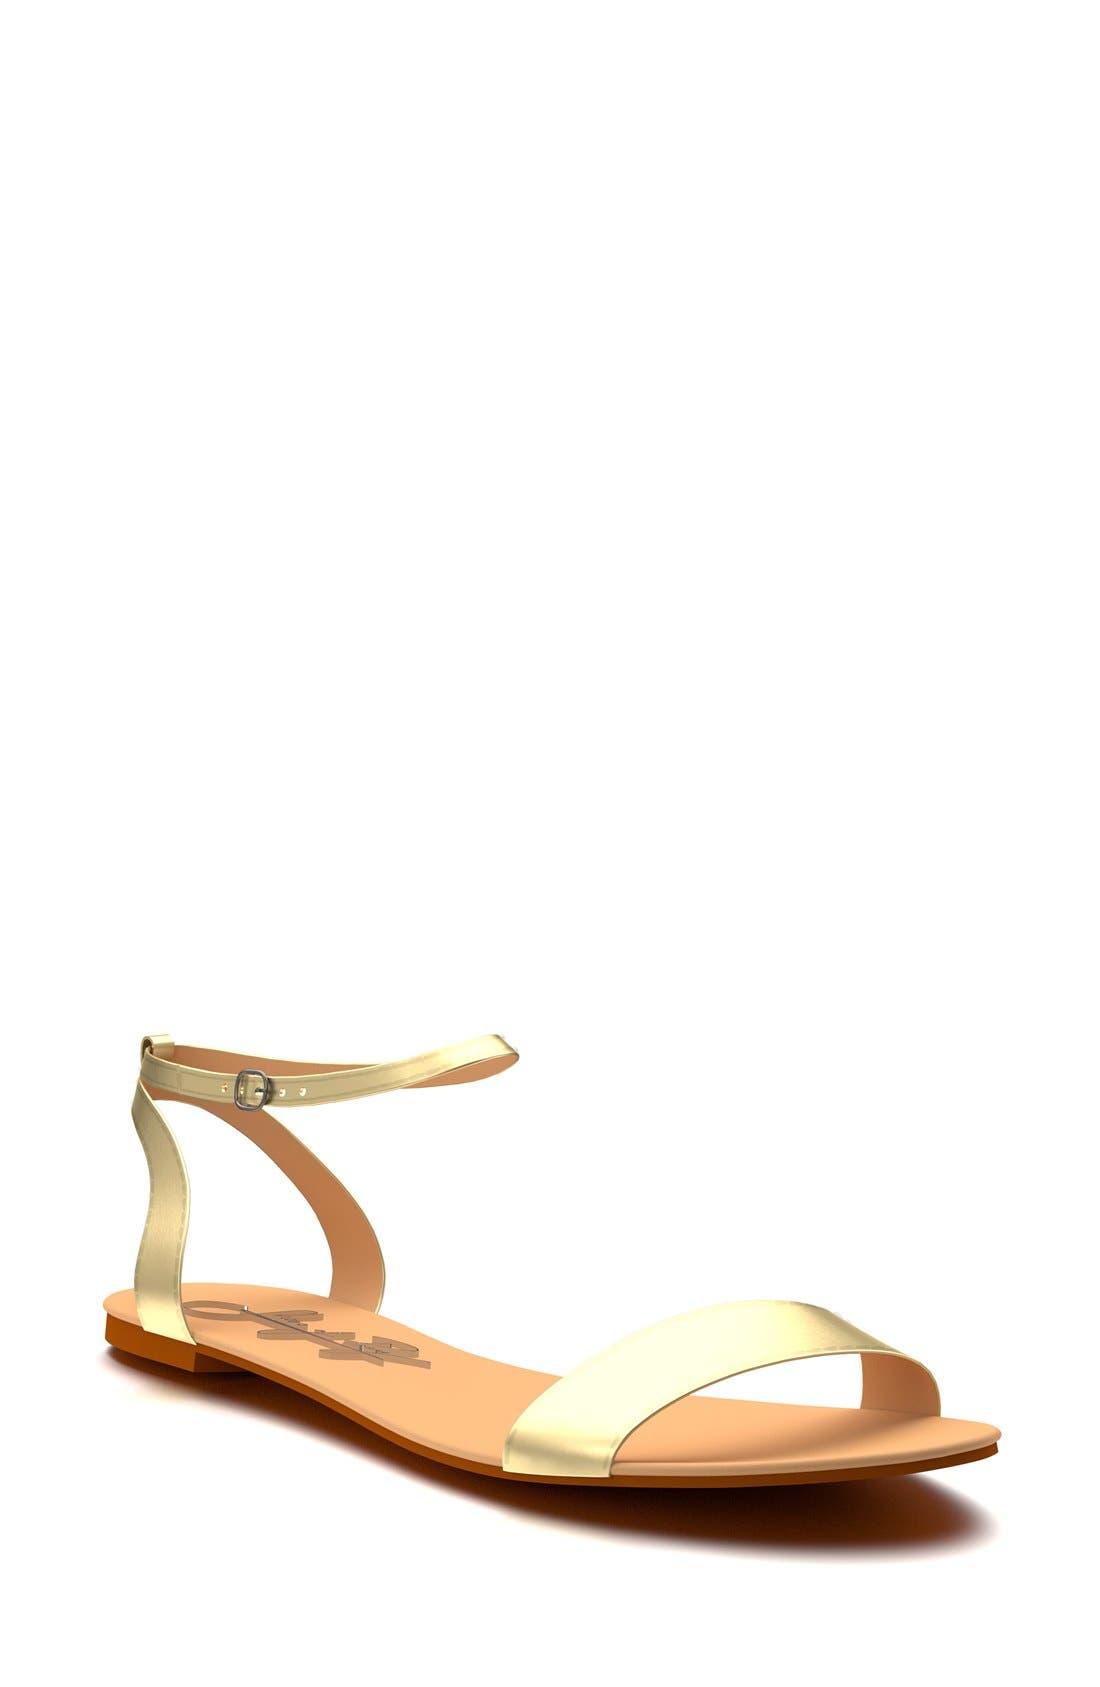 Metallic Ankle Strap Sandal,                             Main thumbnail 1, color,                             710